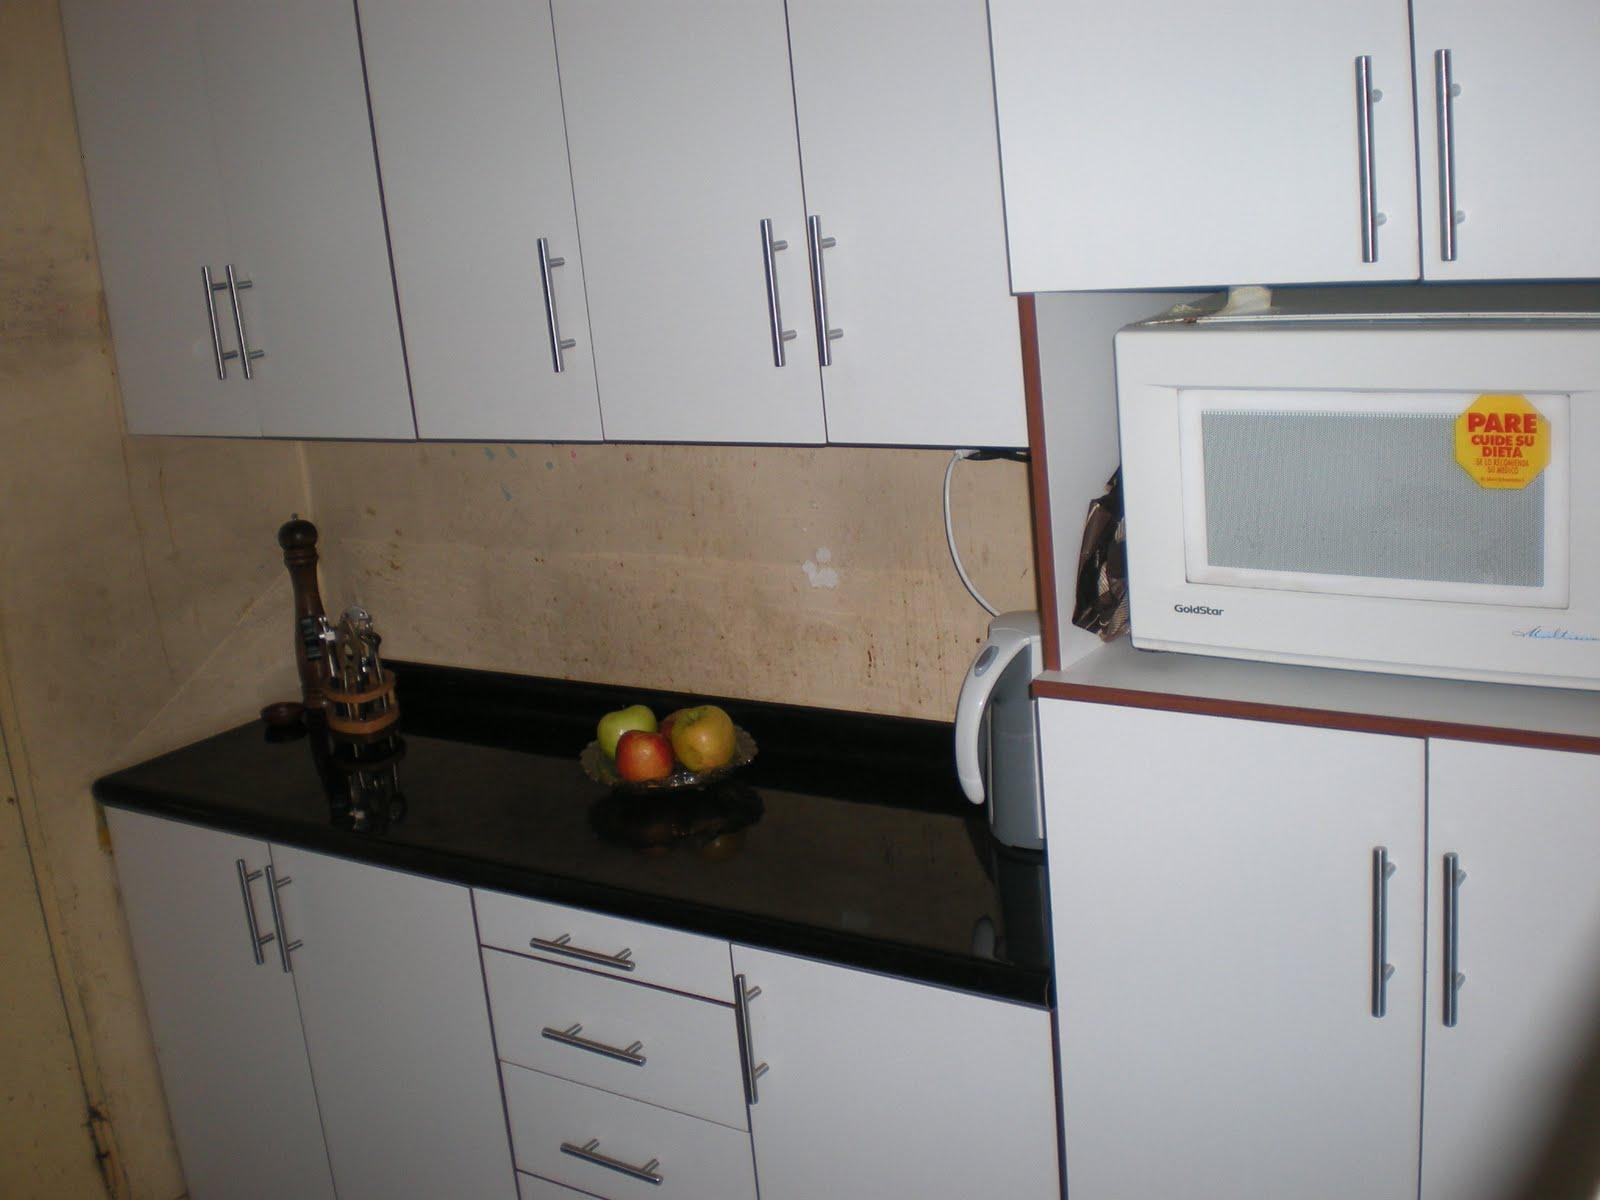 Muebles jorge ib ez cocina for Severino muebles cocina alacena melamina blanca